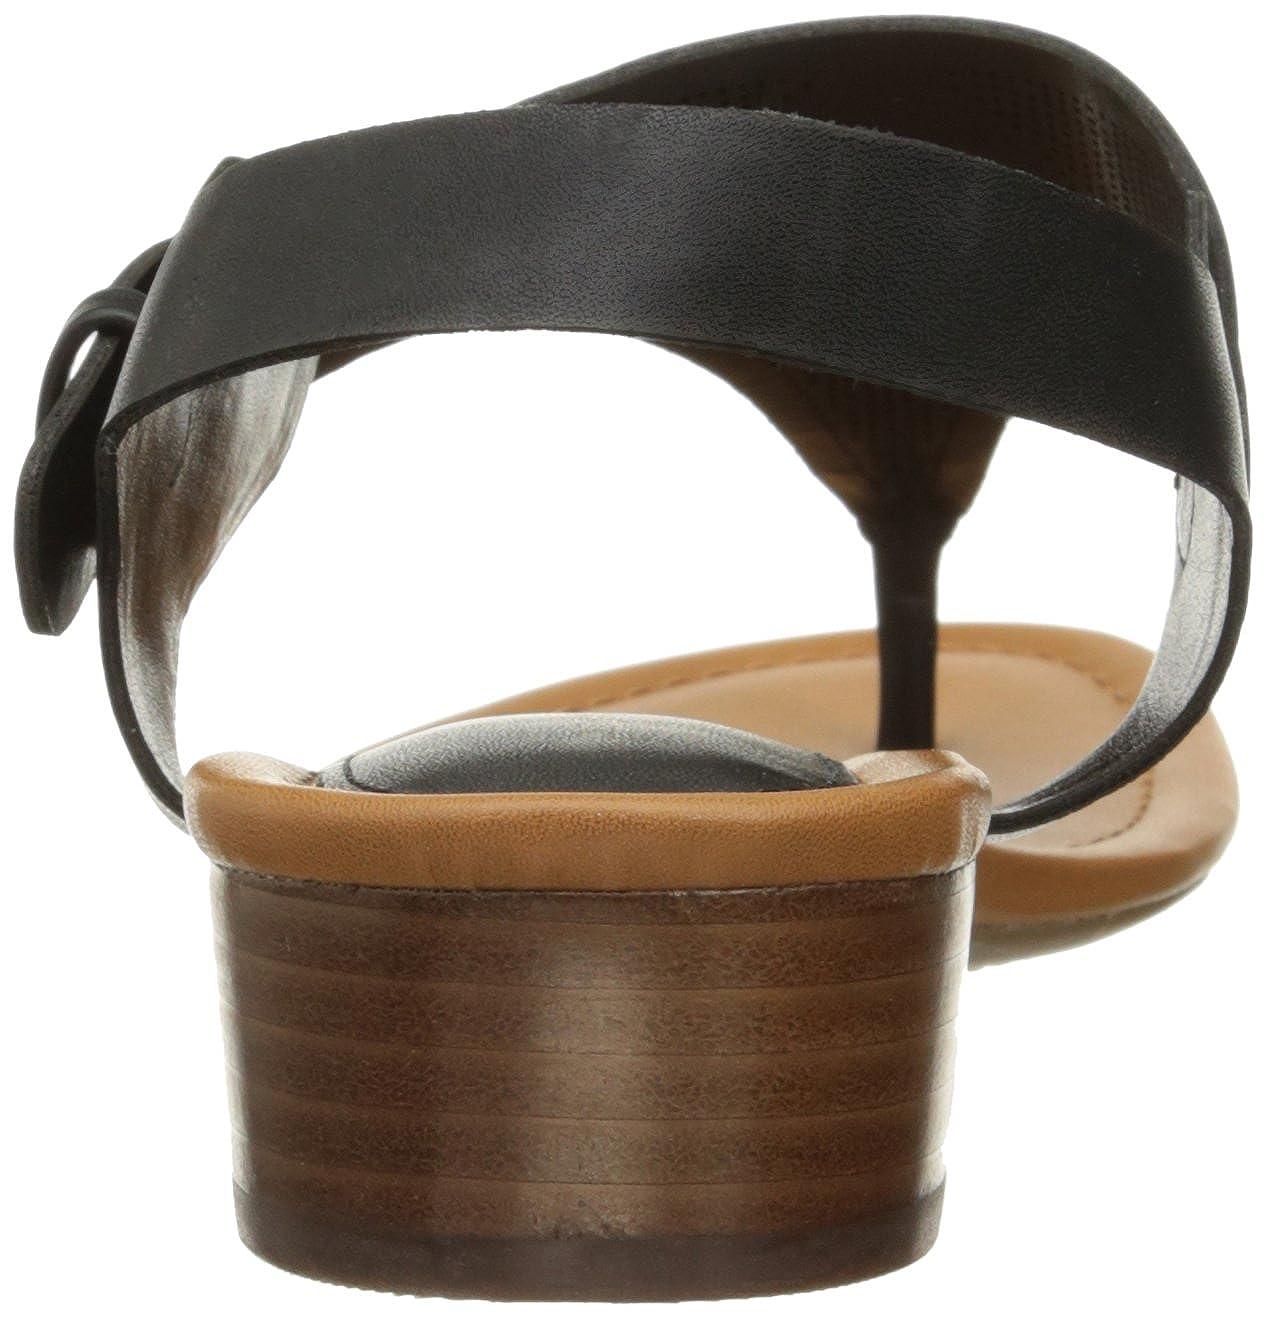 8d43527ebf54 Amazon.com  Tommy Hilfiger Women s Kandess Heeled Sandal  Shoes